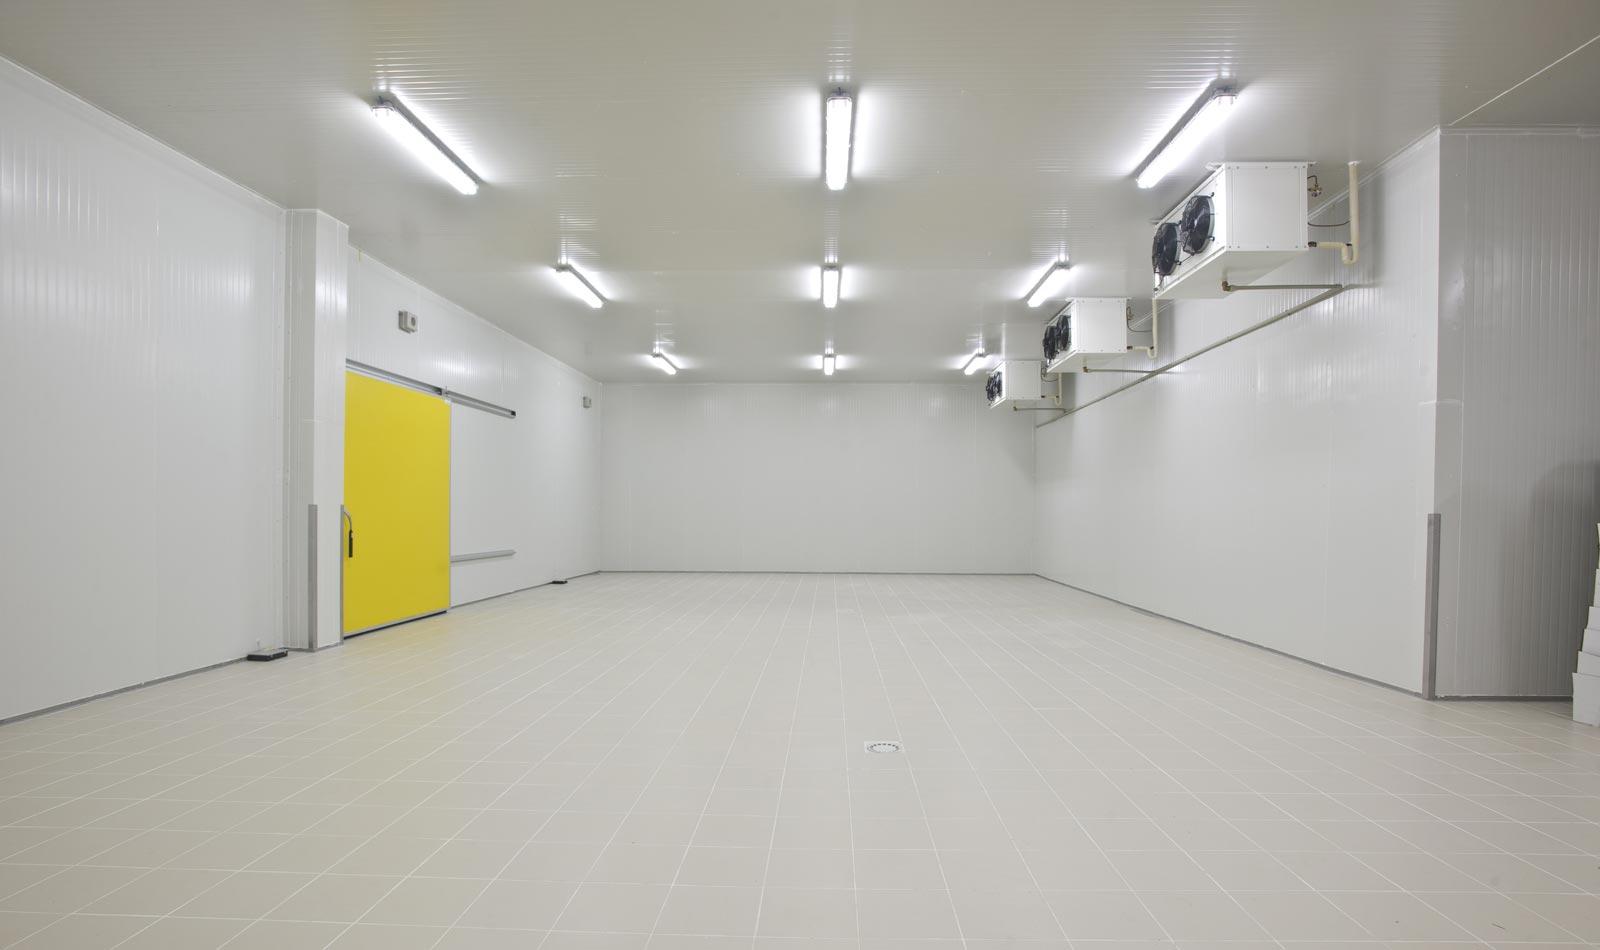 SAAF socit angevine des applications du froid isolation frigorifique SAAF chambre froide